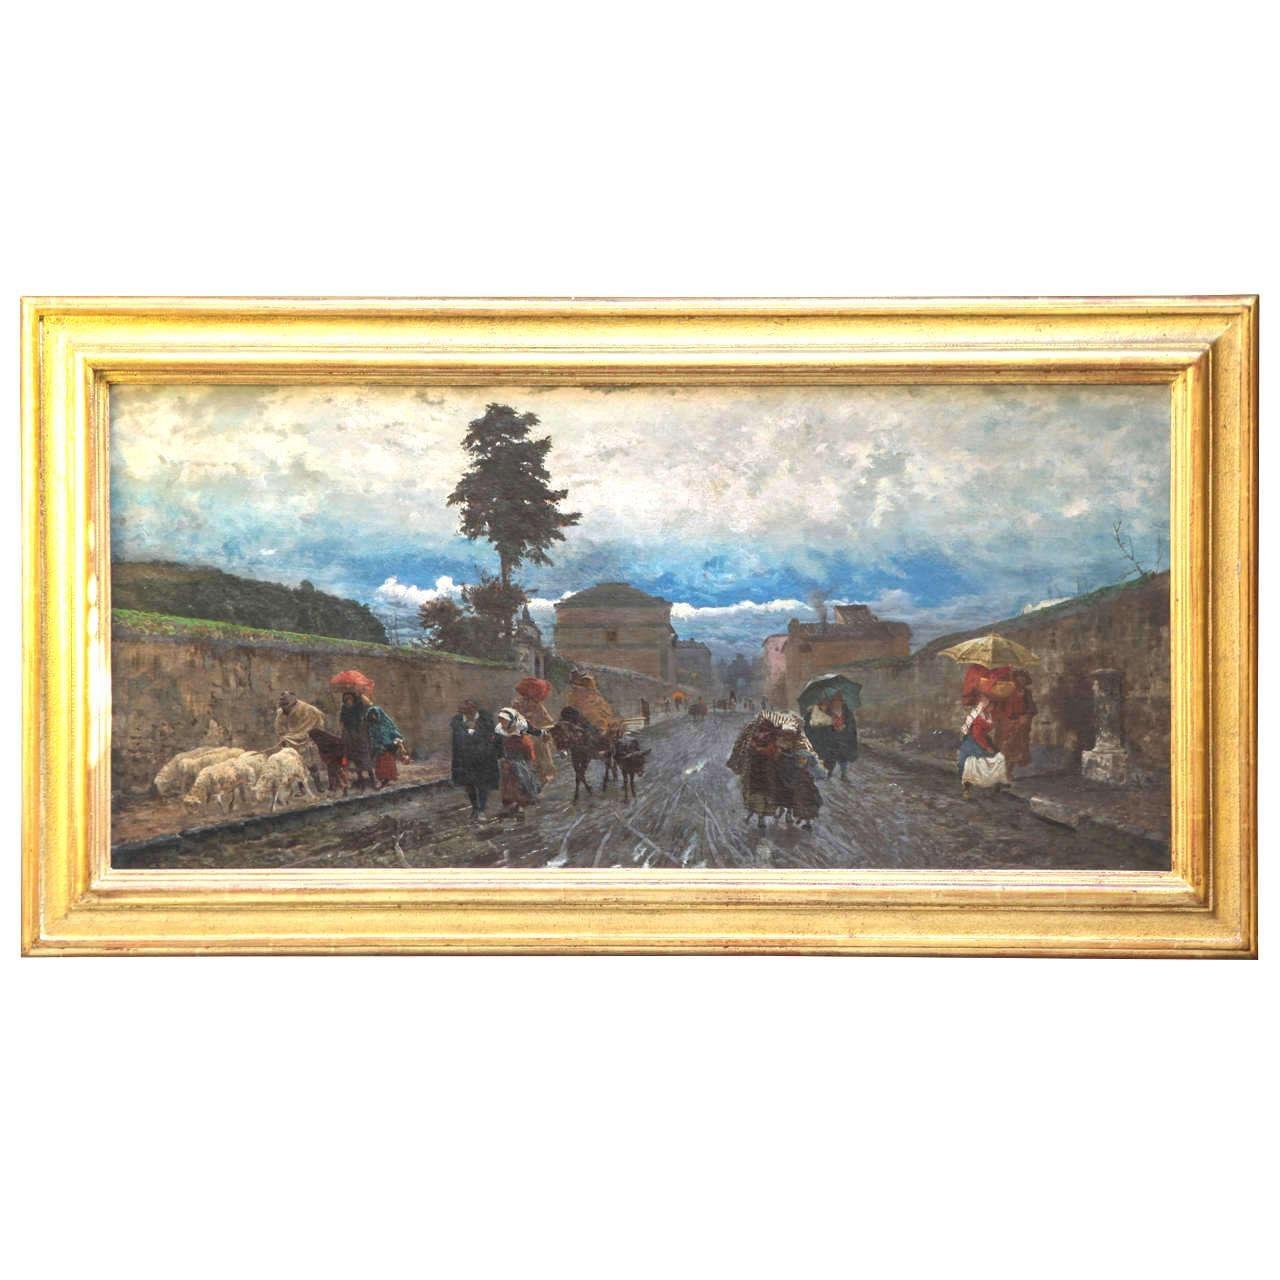 19th Century Italian Landscape Oil Painting - Via Flaminia on a Sunday morning